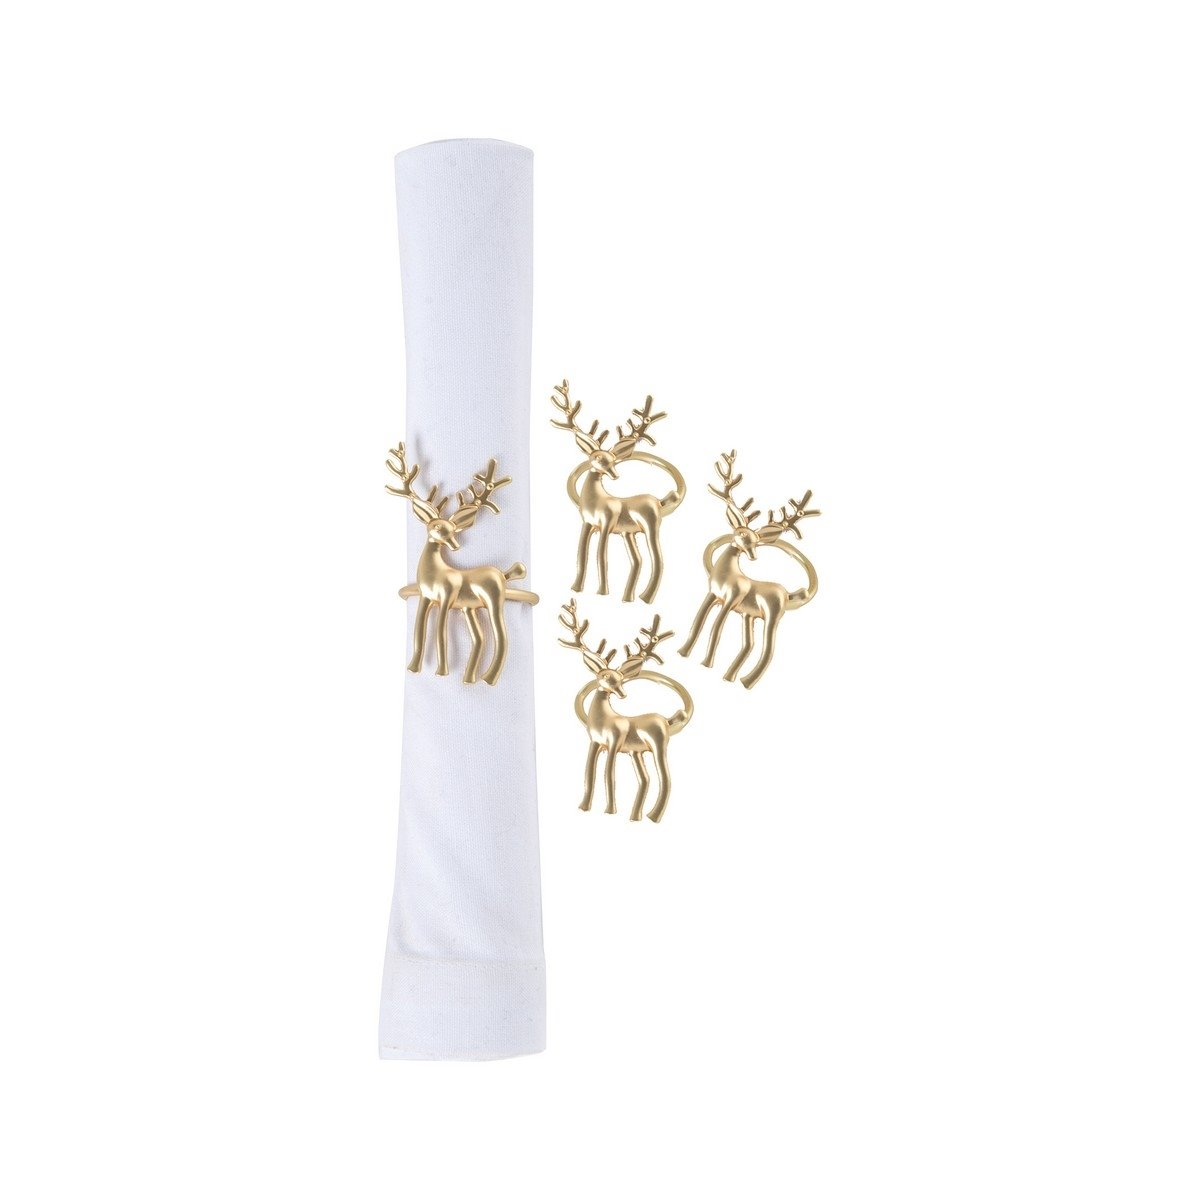 Gold Deer Napkin Ring- Set of 4